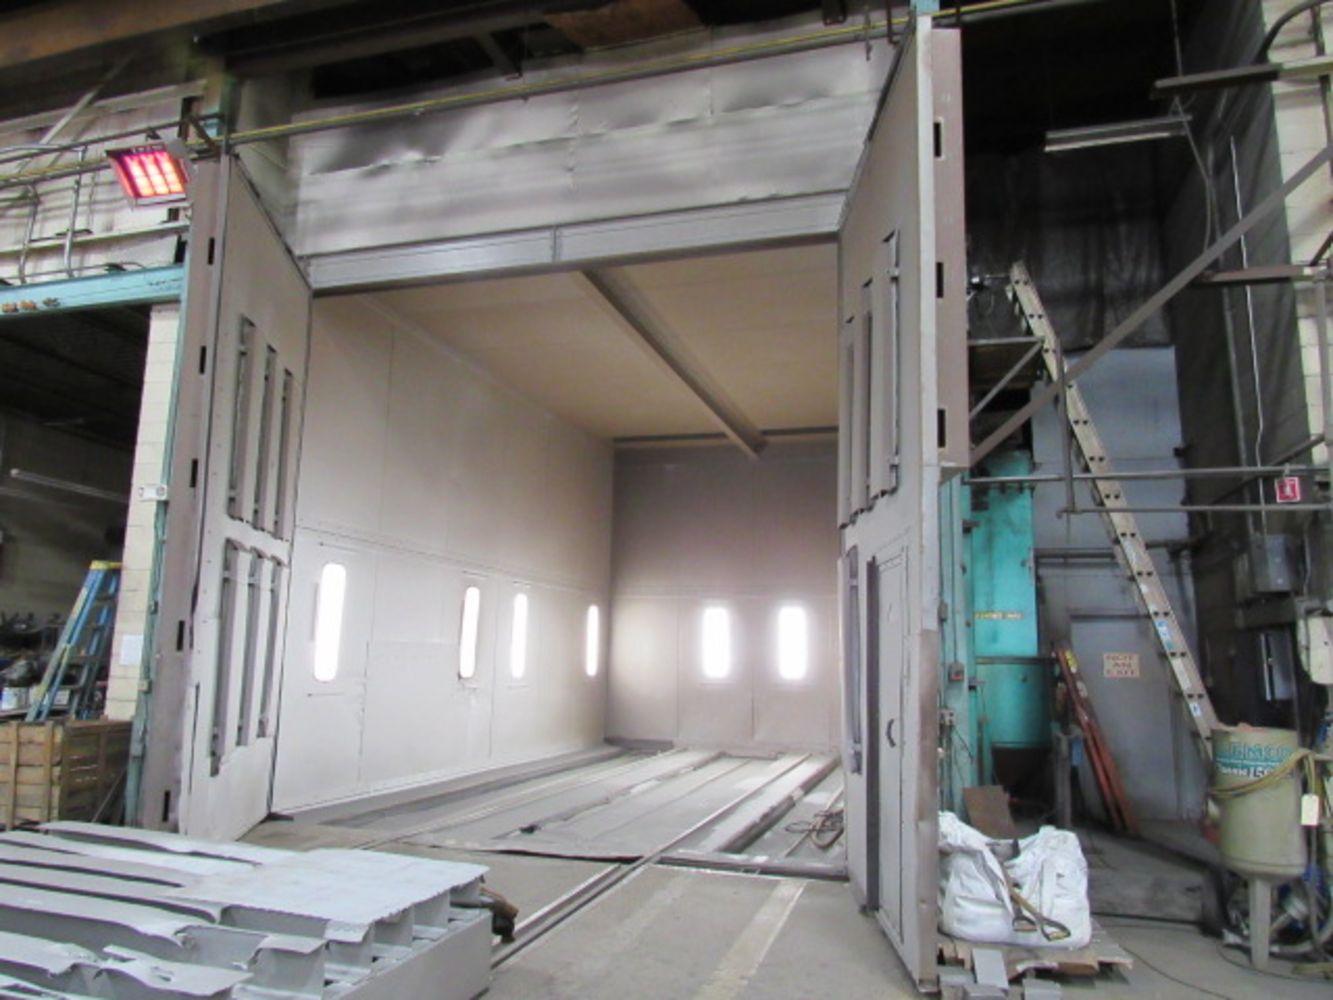 KEN-WELD COMPANY, INC. - Car Bottom Furnace, Blast Room, Cranes & Support Equipment